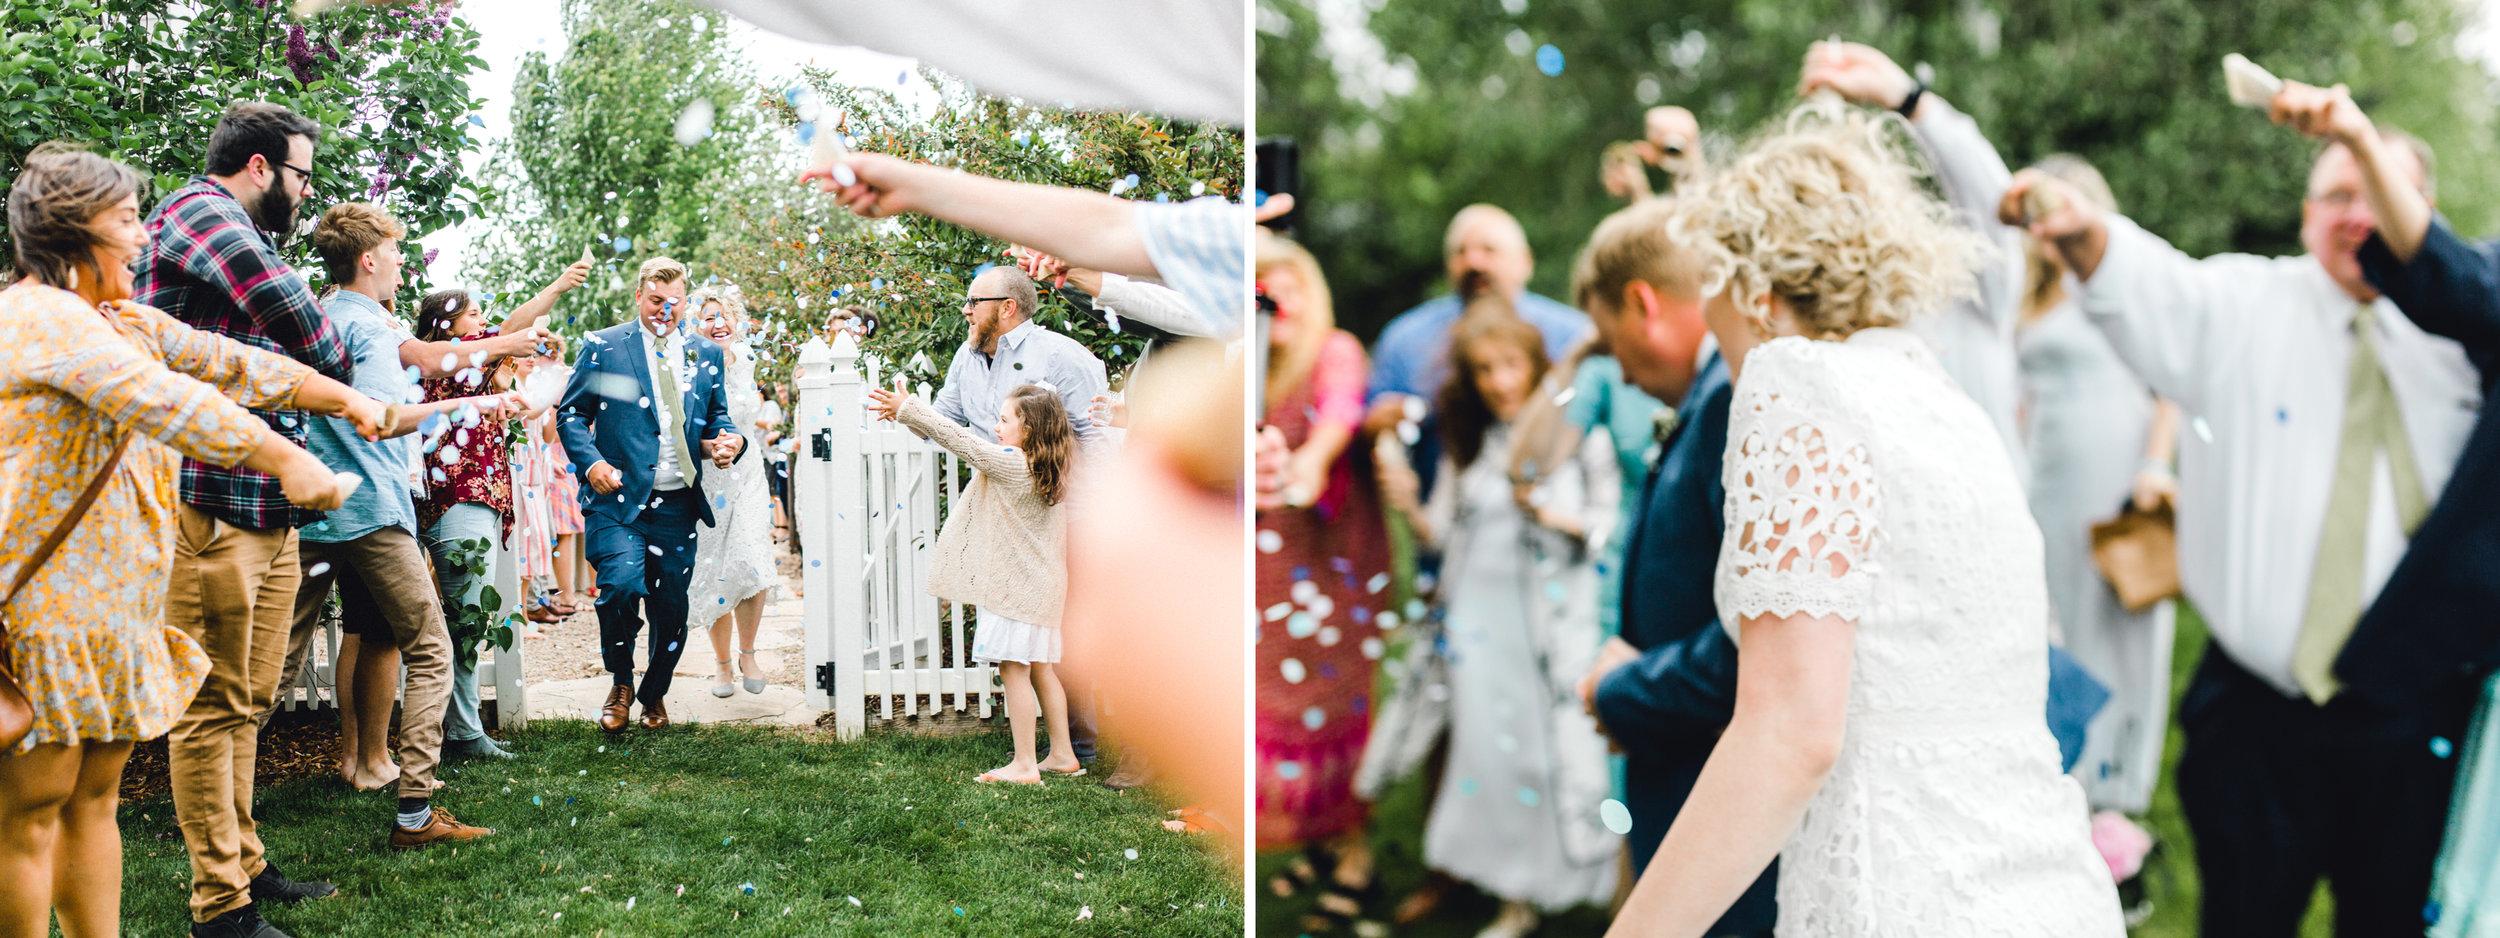 beautiful-outdoor-backyard-wedding-reception-anna-christine-photography-rexburg-idaho-18.jpg